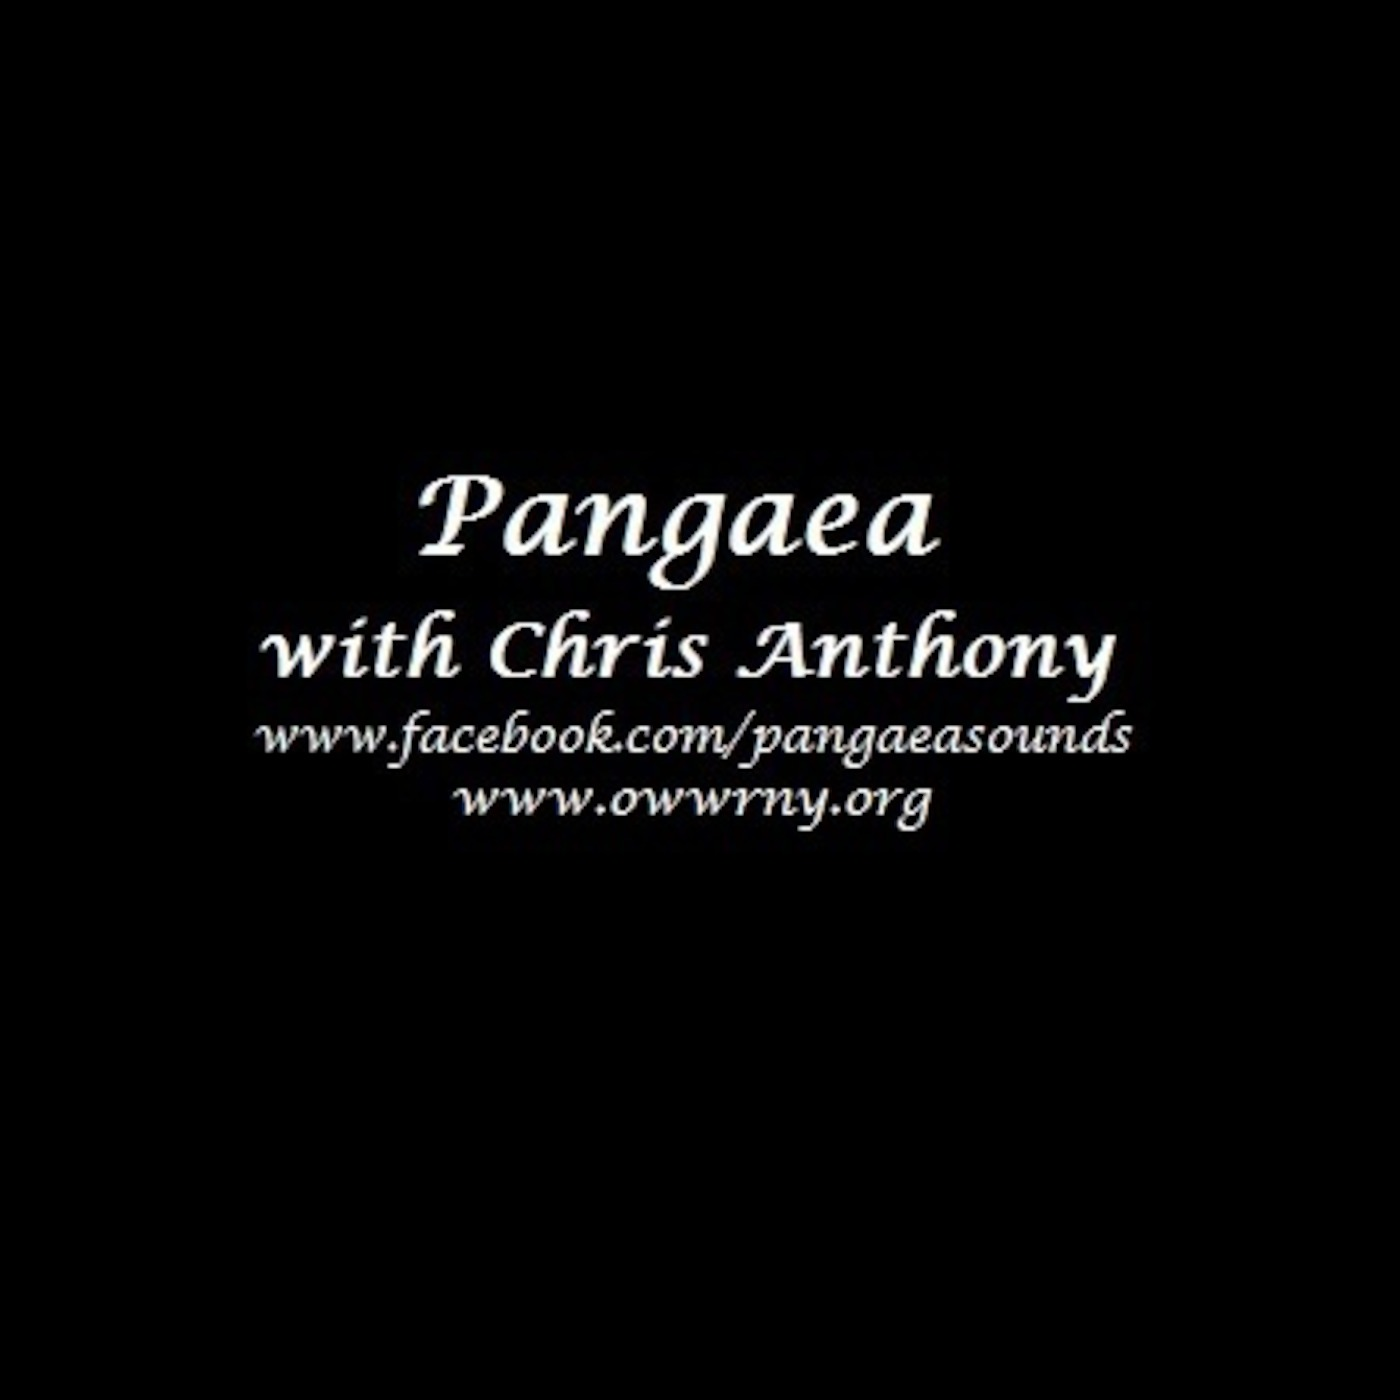 Pangaea with Chris Anthony